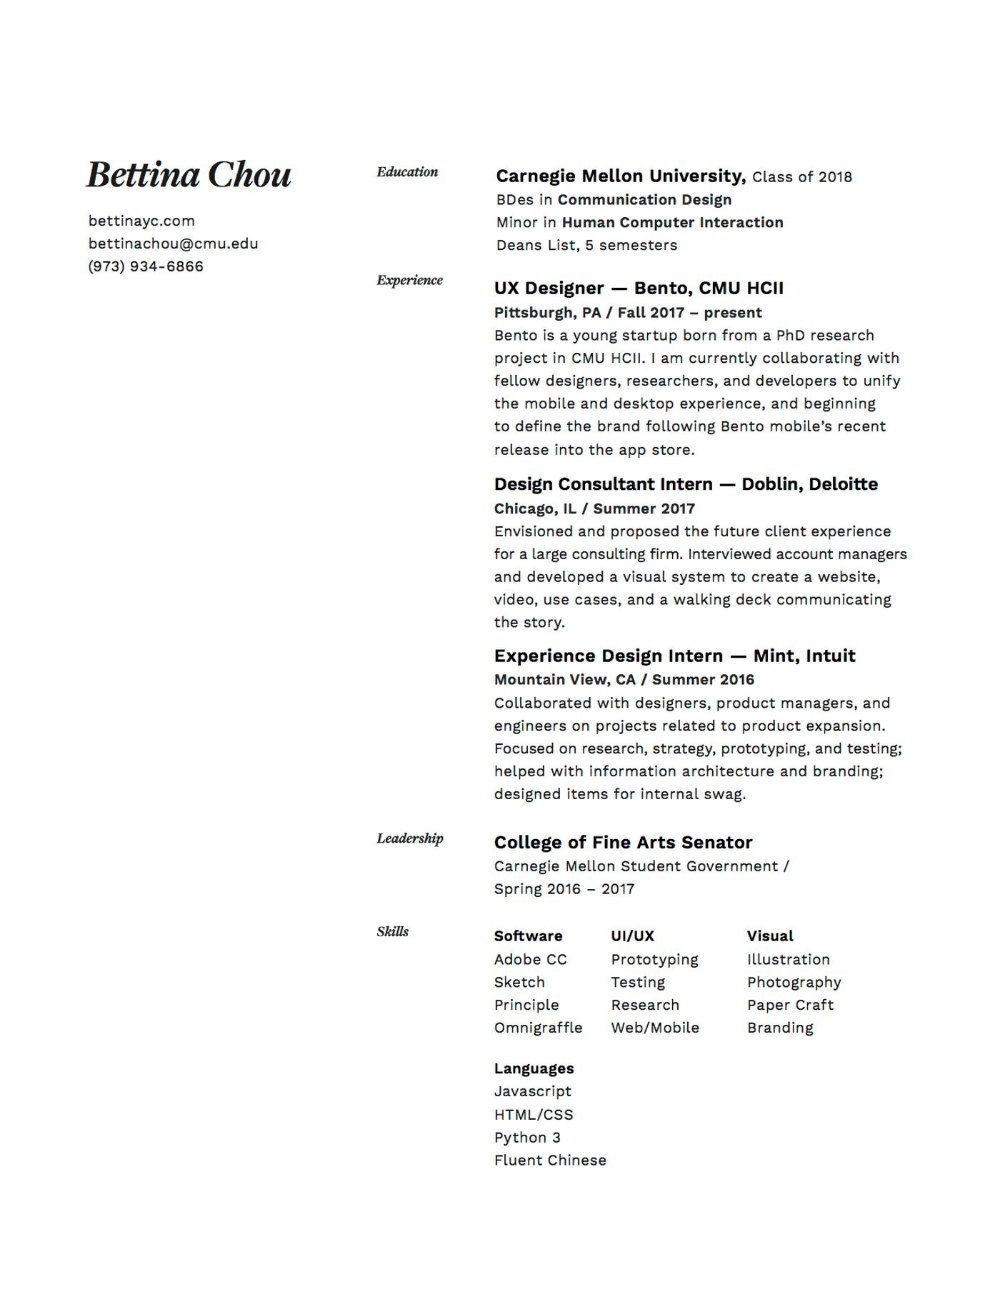 Bestfolios Bettina Chou Graphic Design Resume Resume Design Graphic Design Cv